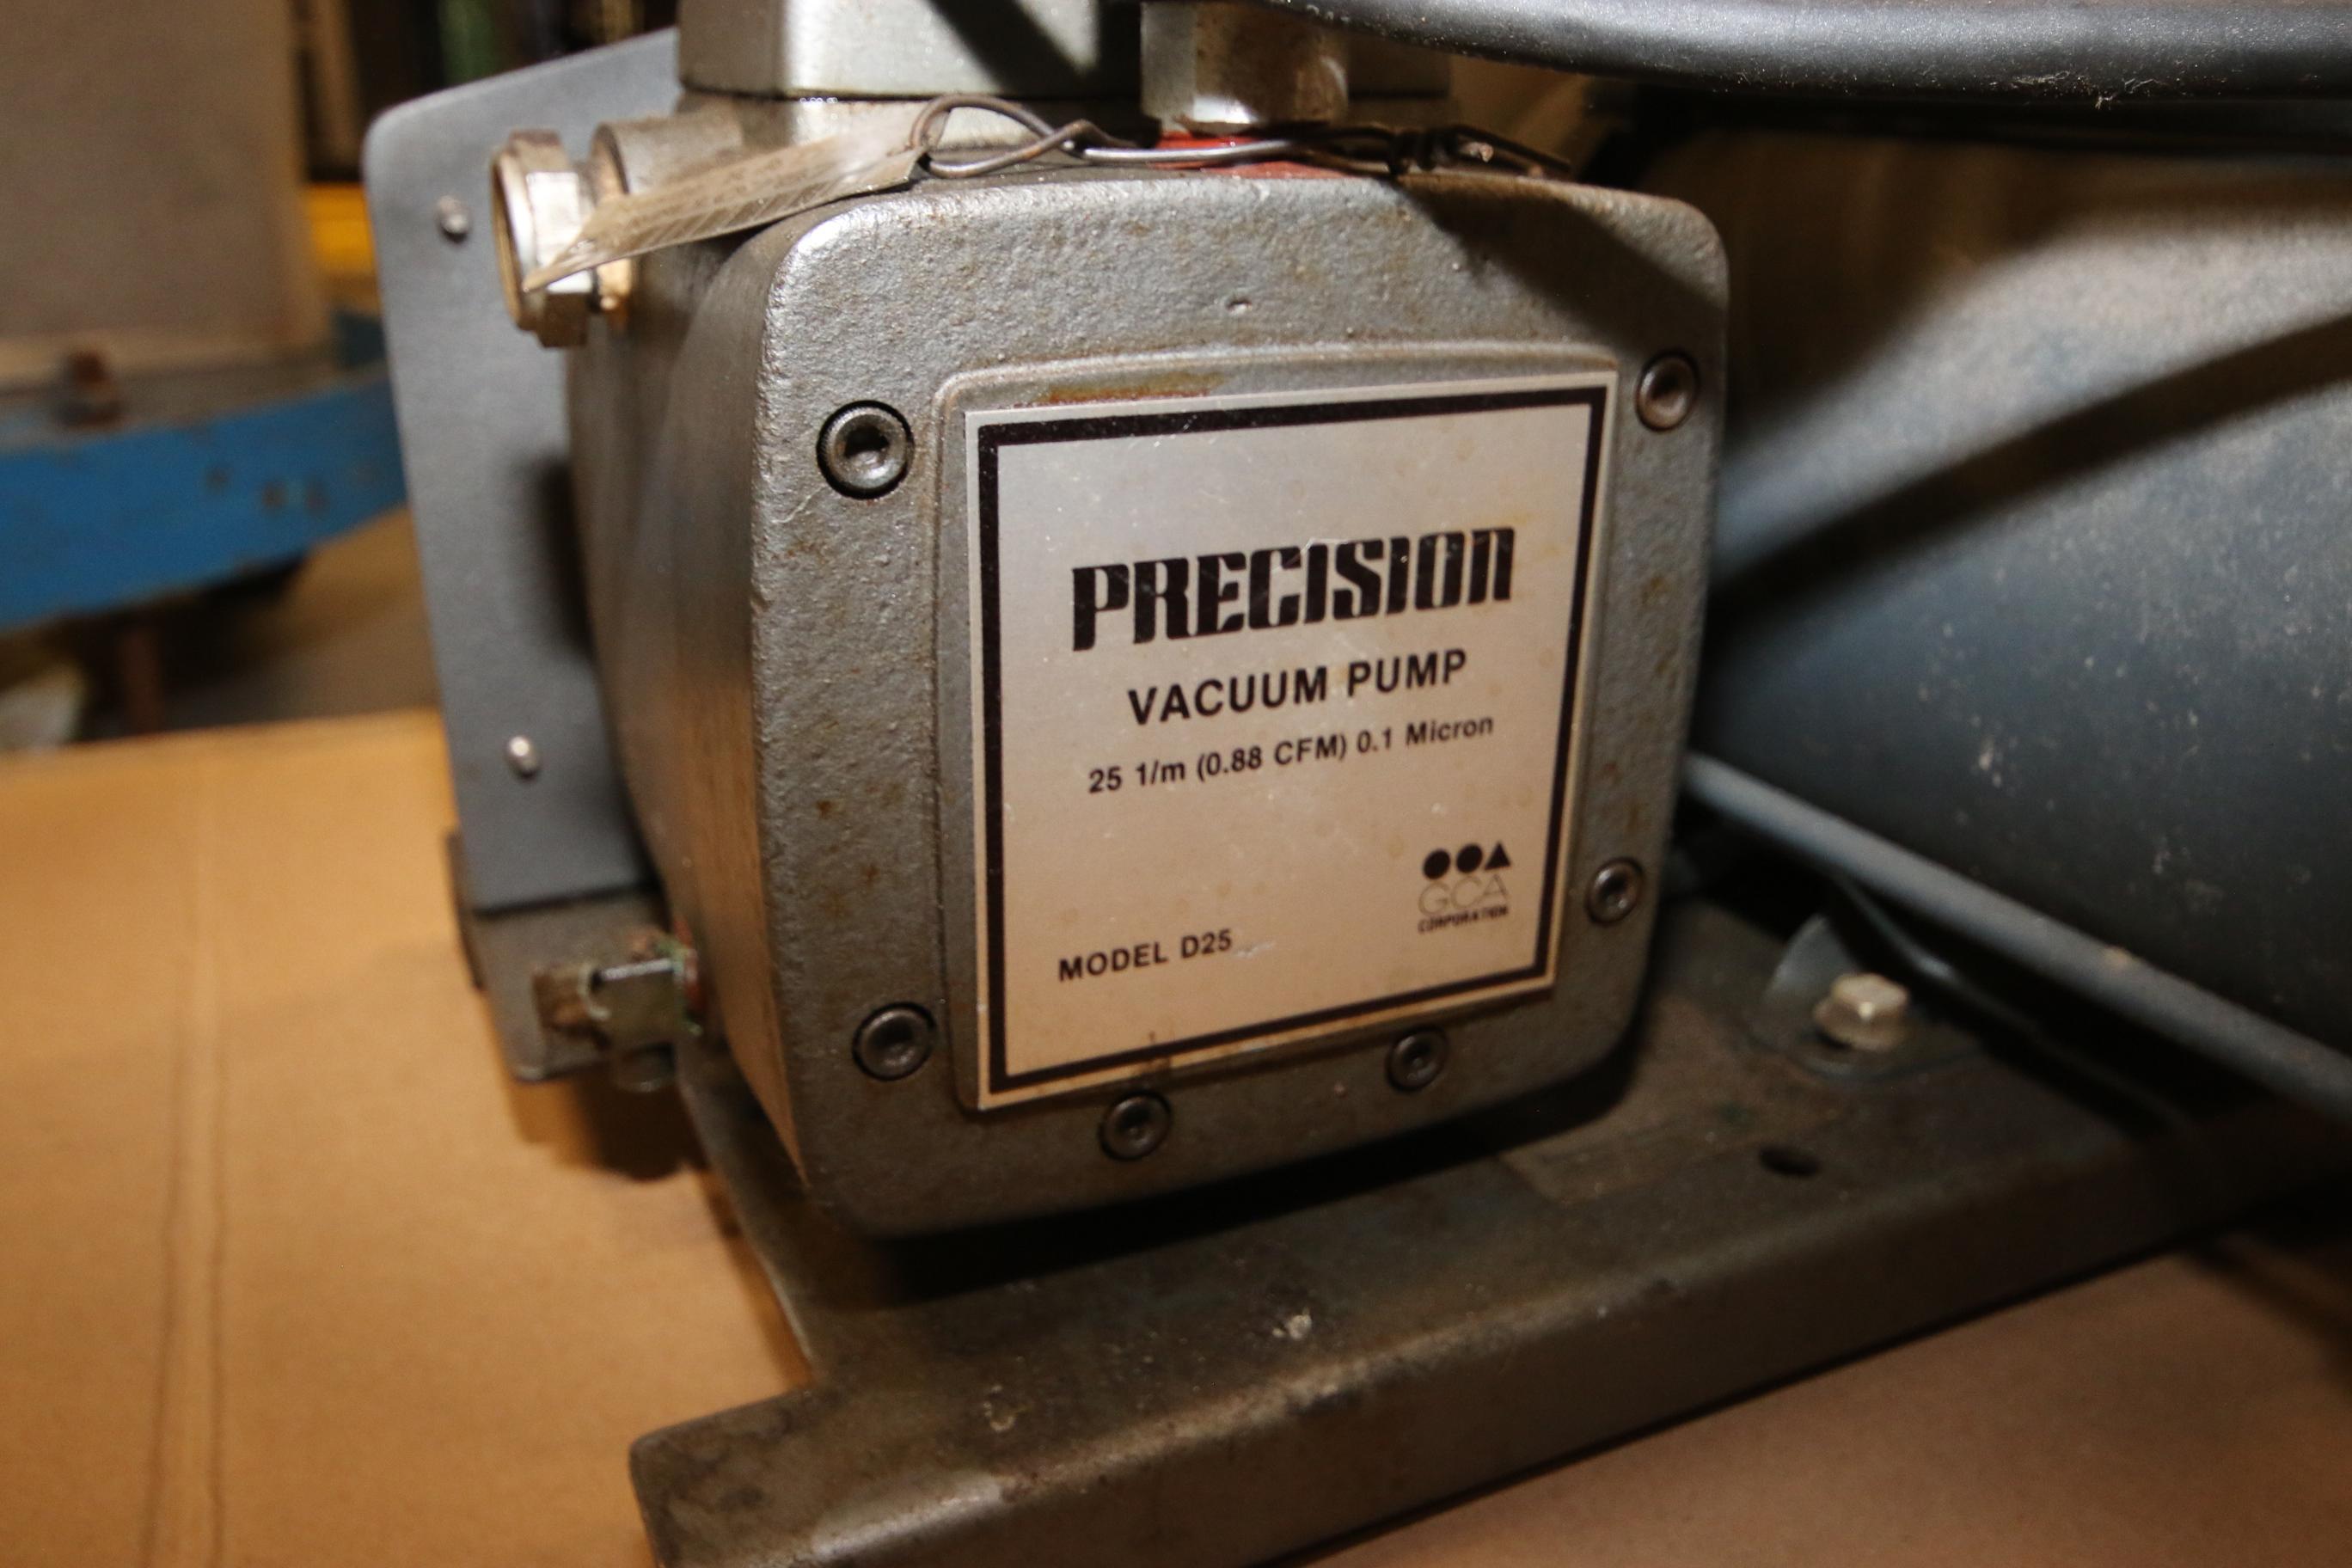 Lot 180 - Precision 1/3 hp Vacuum Pump, M/N D25, 1725/1425 RPM Motor